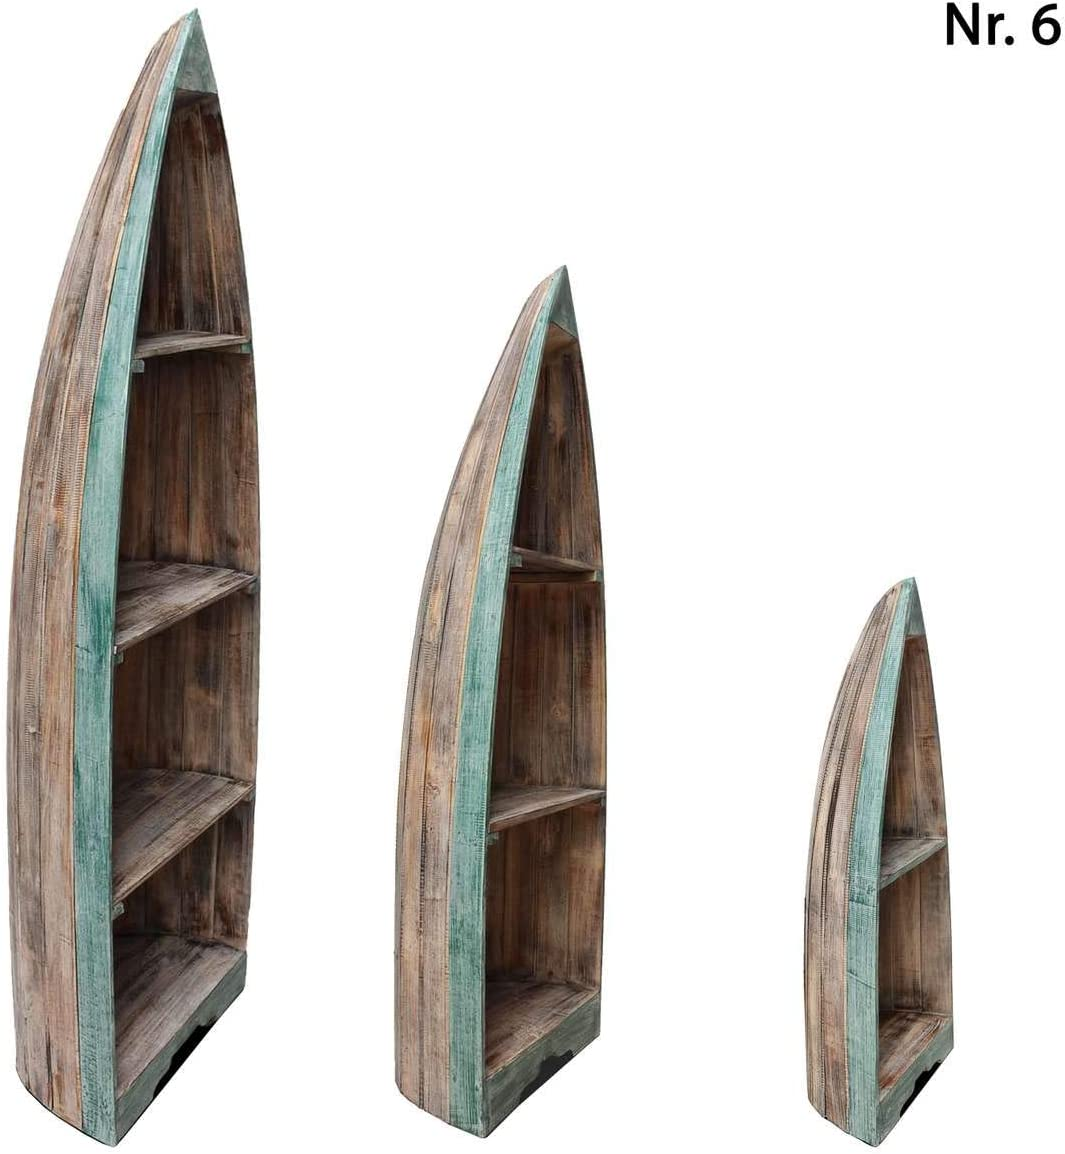 10 Gr/ö/ße:Gro/ß Design:Nr Oriental Galerie Bootsregal Regal im Boots-Design Holzregal Standregal Aufbewahrung Konsole Bord Albesia Holz